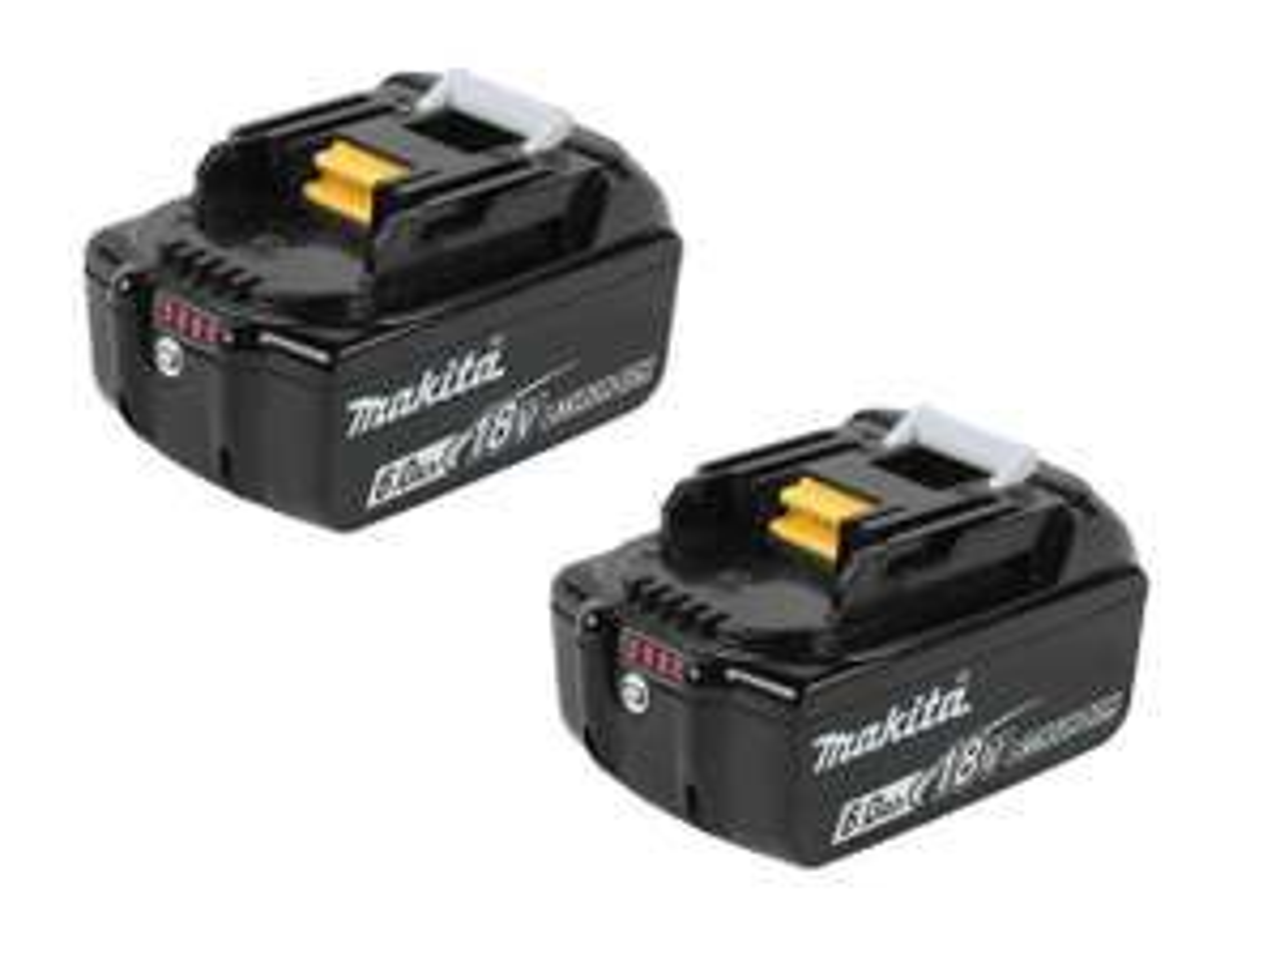 Makita BL1860BX2 18v 6Ah LXT Li-ion Genuine Makstar Battery 2 Pack at FFX for £129